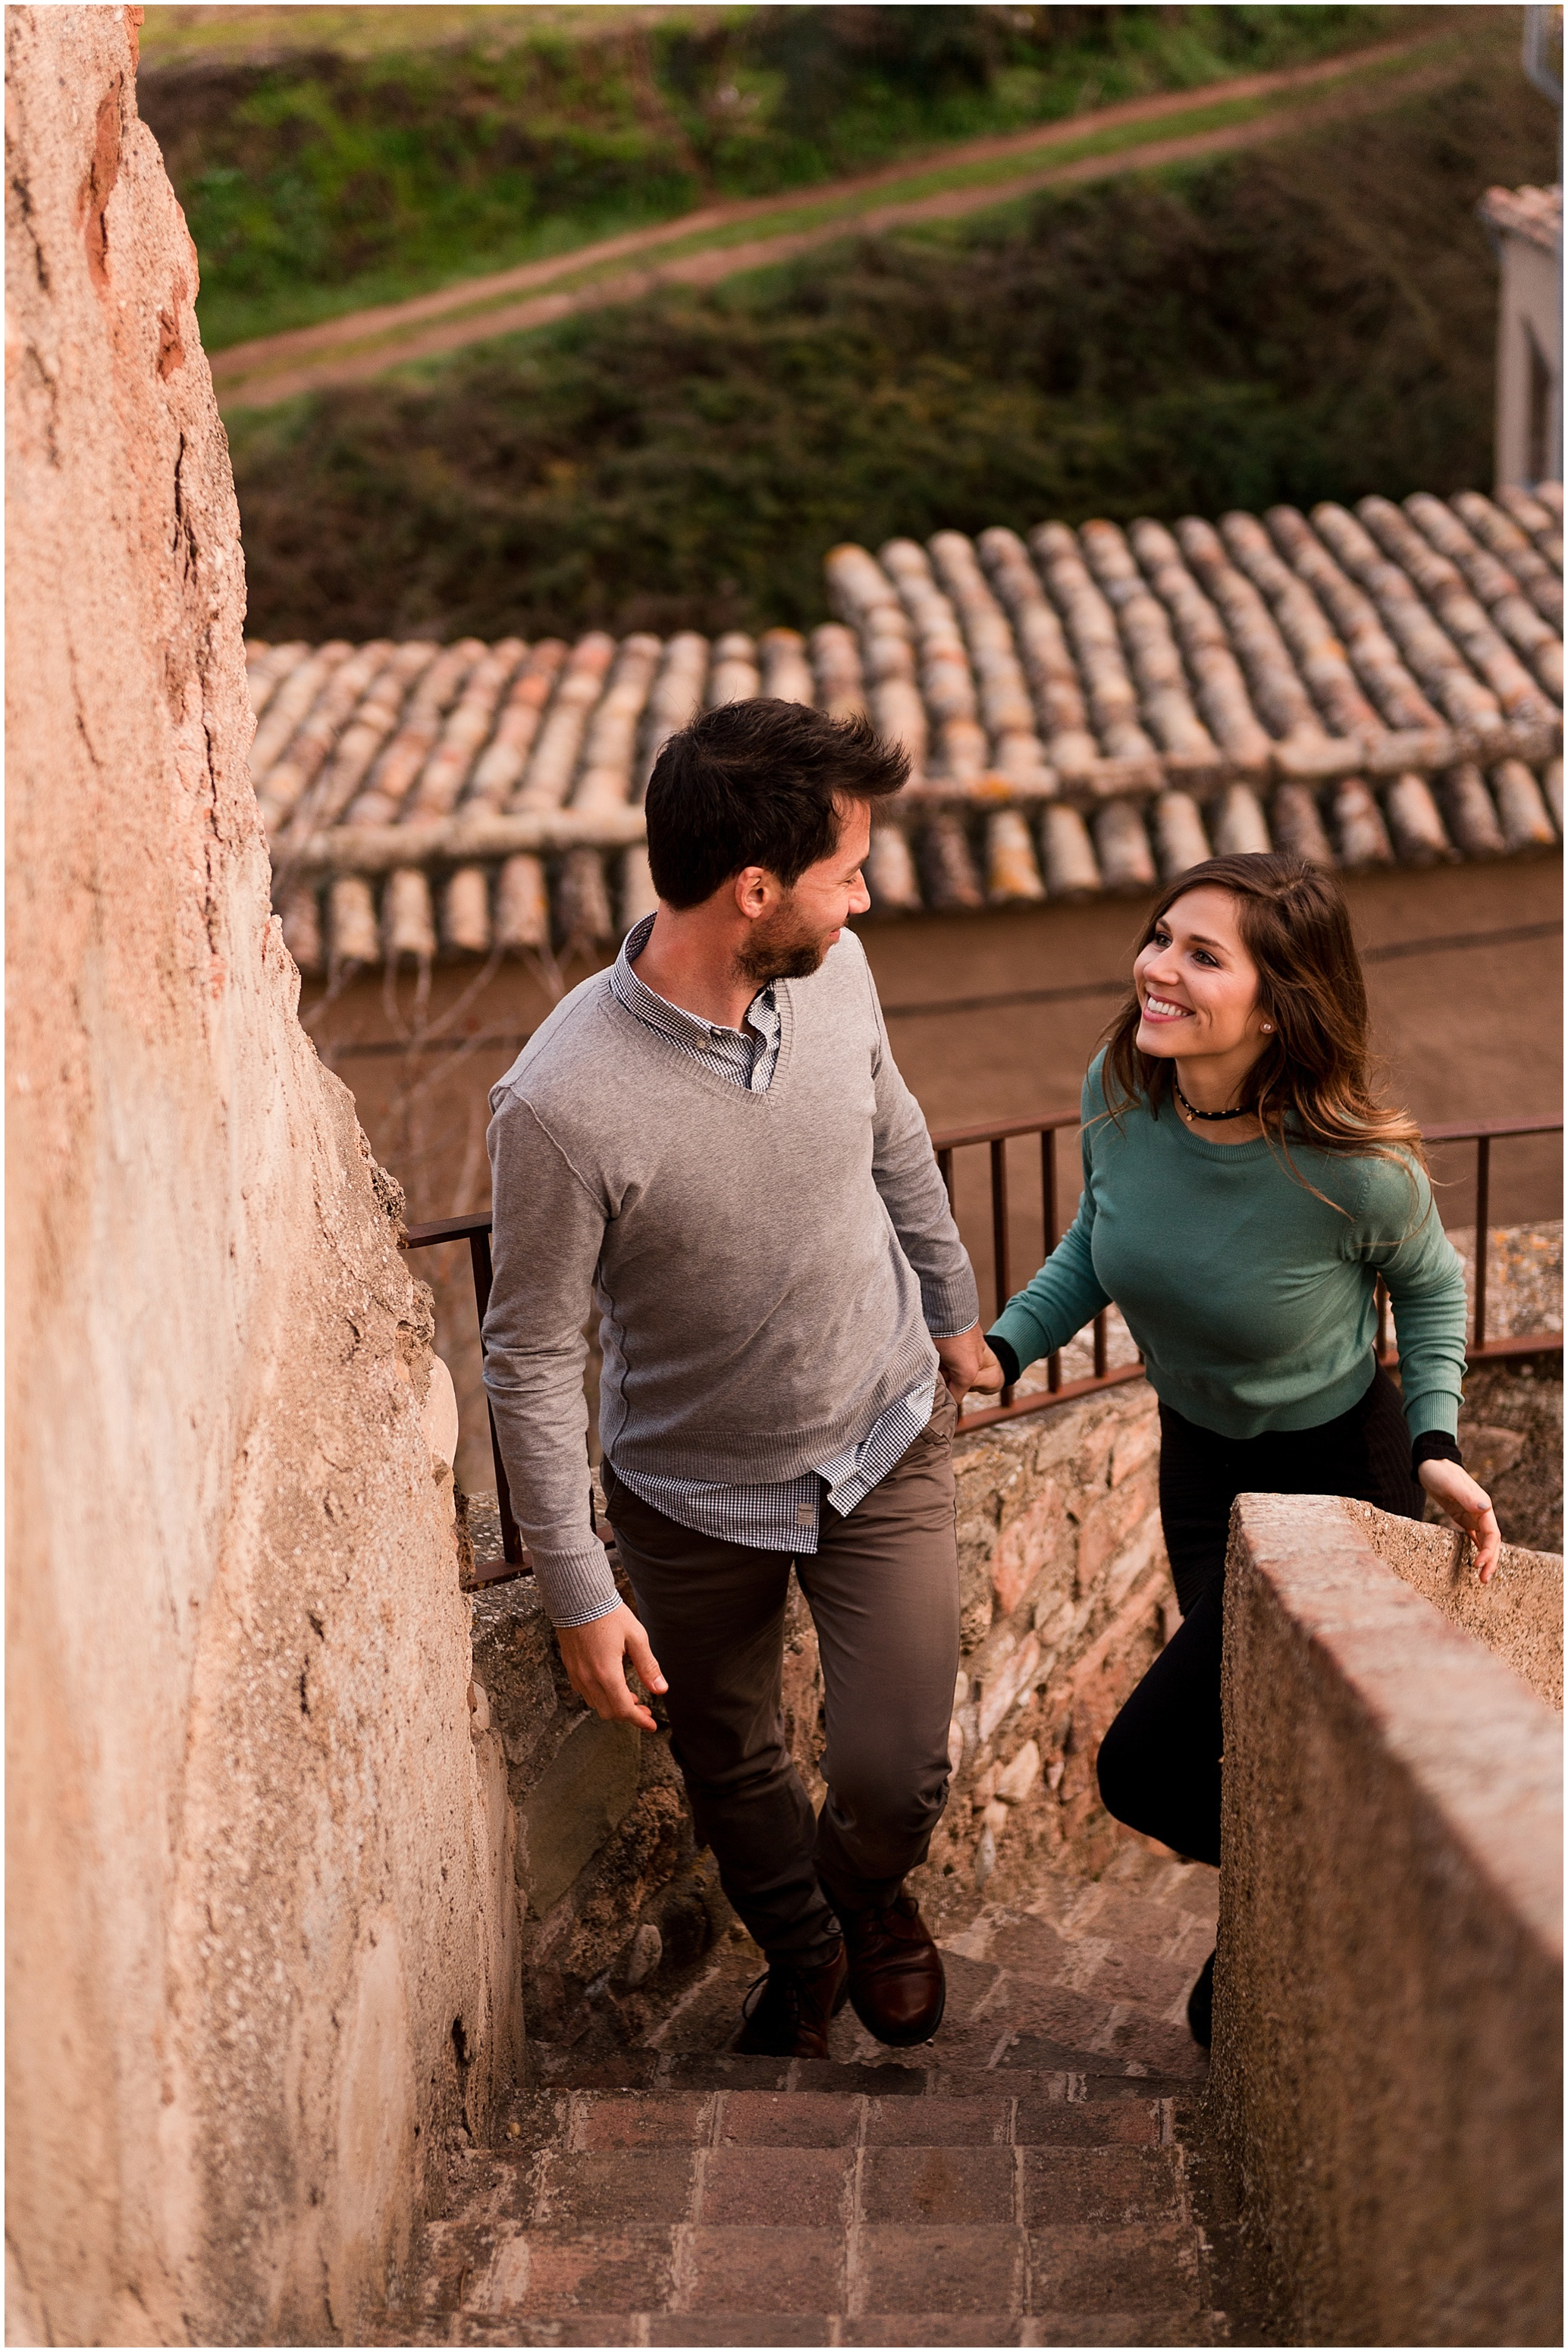 Hannah Leigh Photography Barcelona Spain Engagement Session_3293.jpg